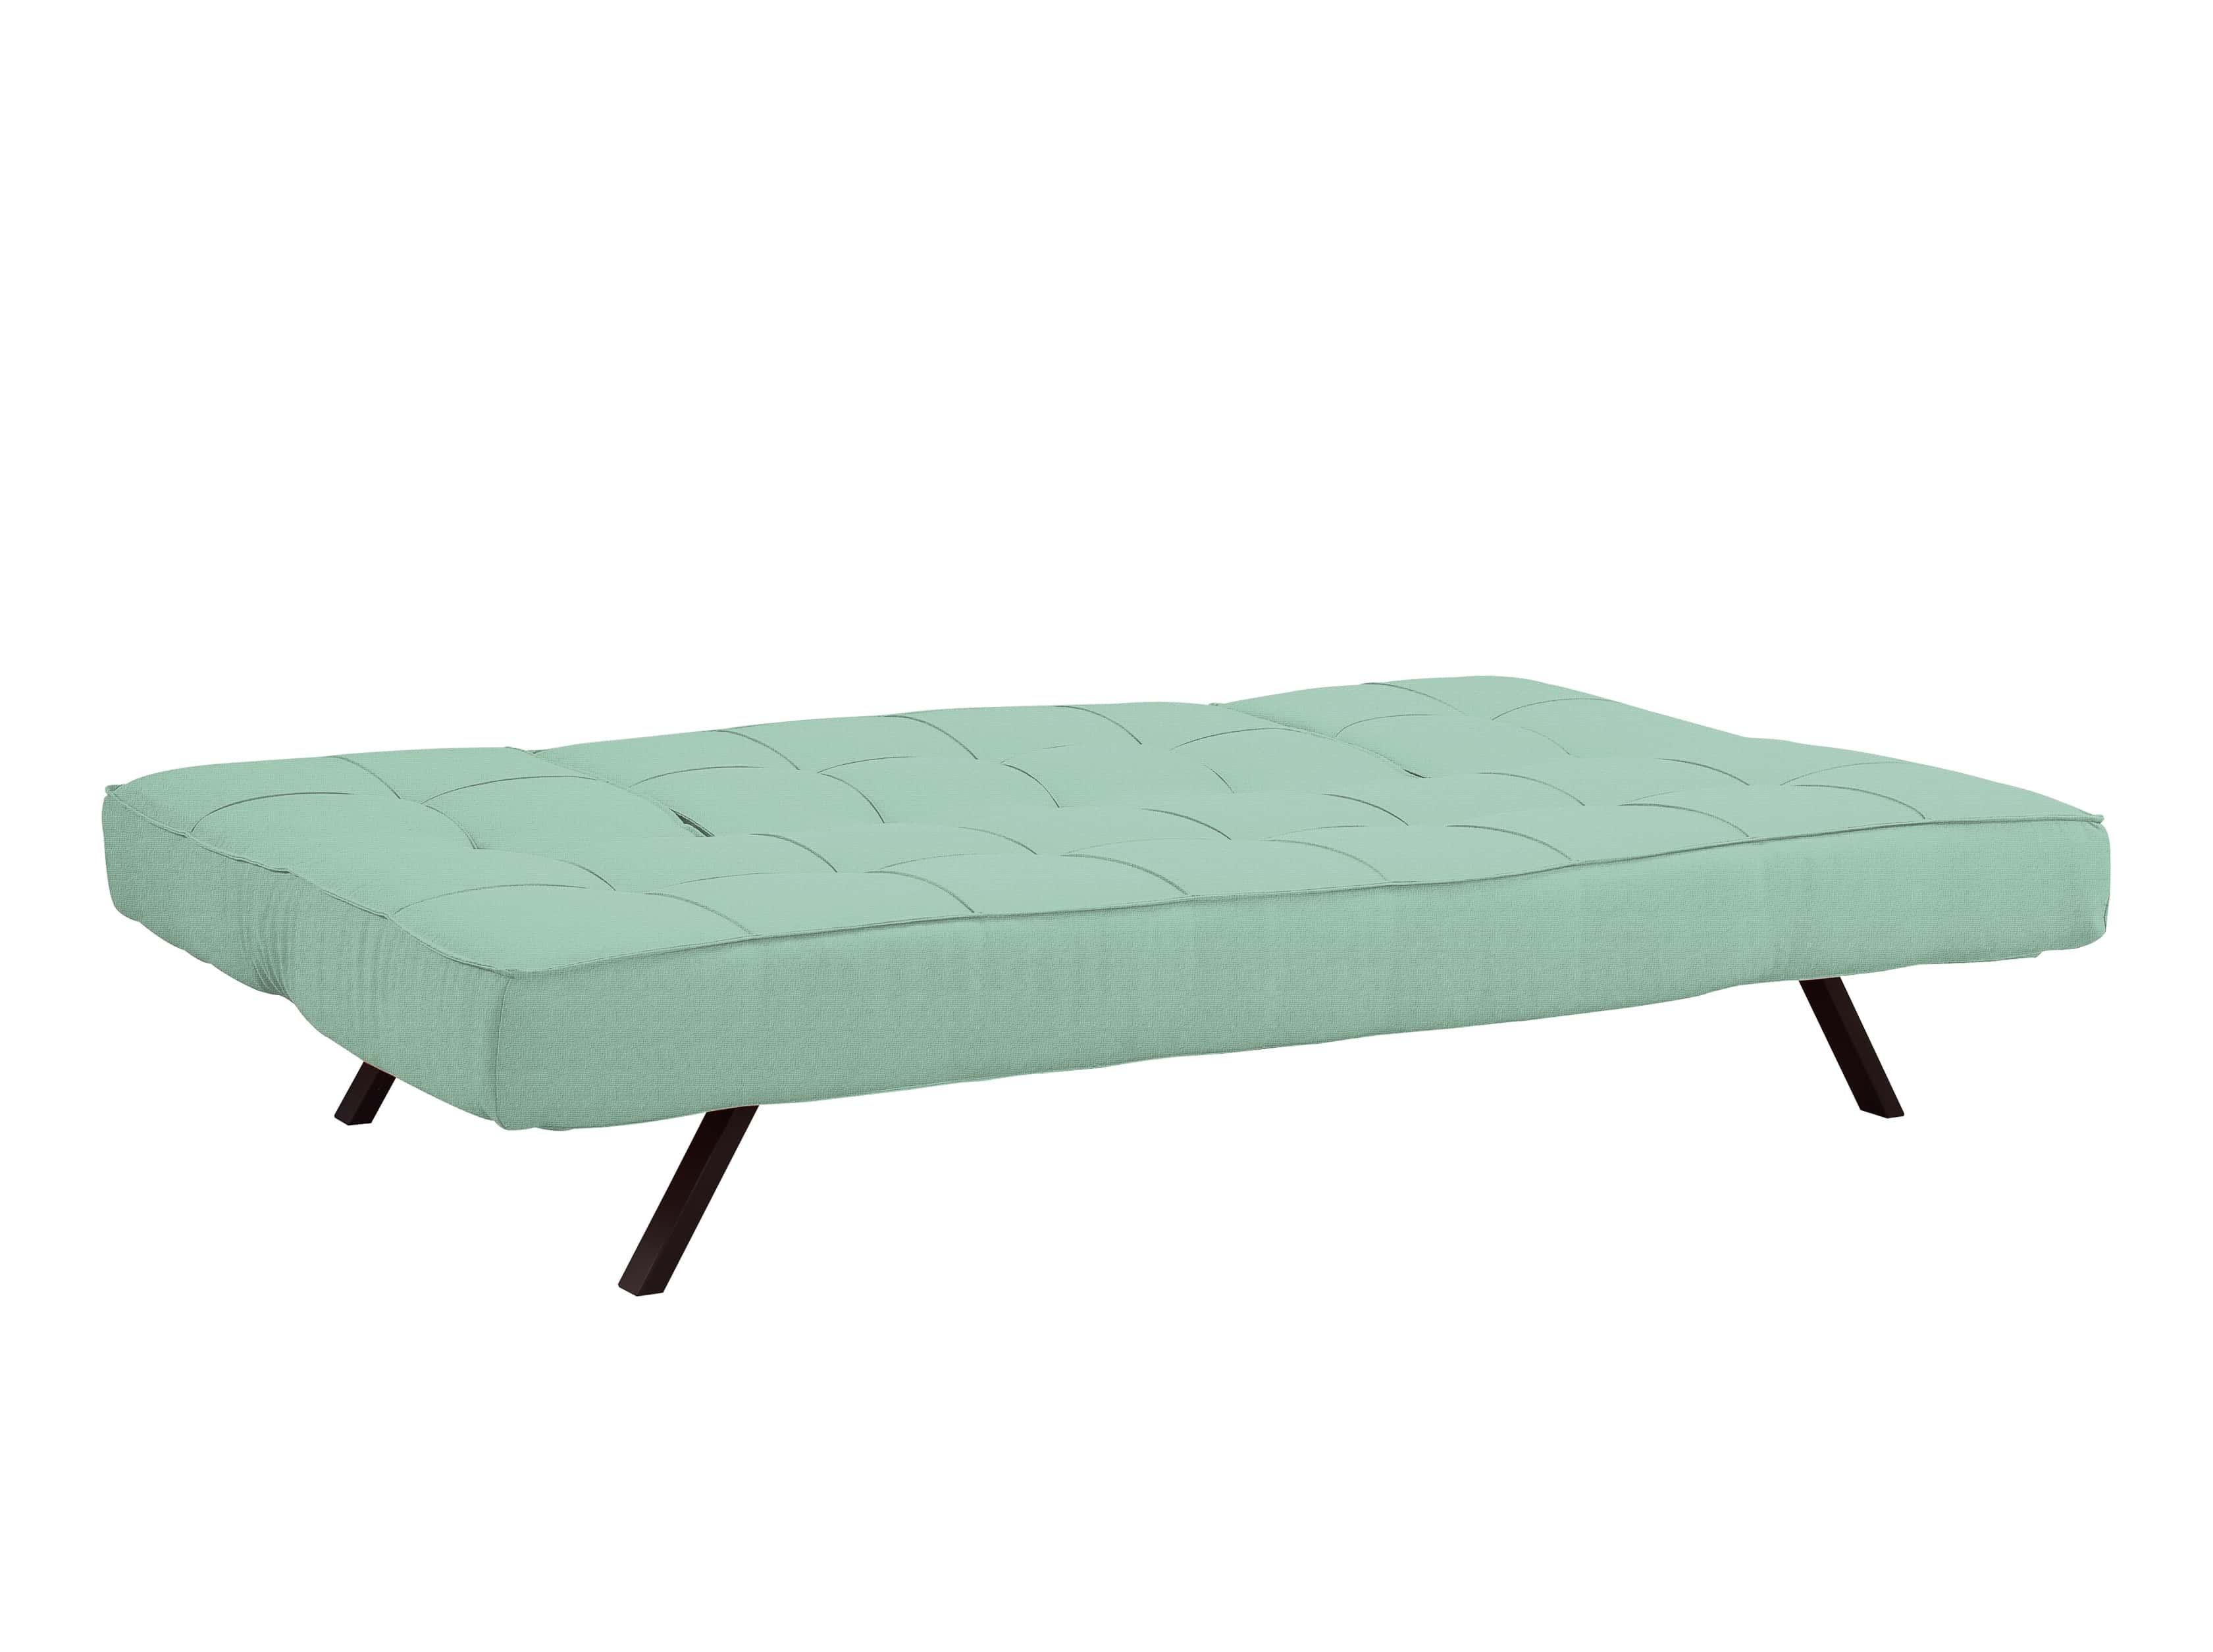 Copa Convertible Sofa Sea Foam Green by Serta Lifestyle